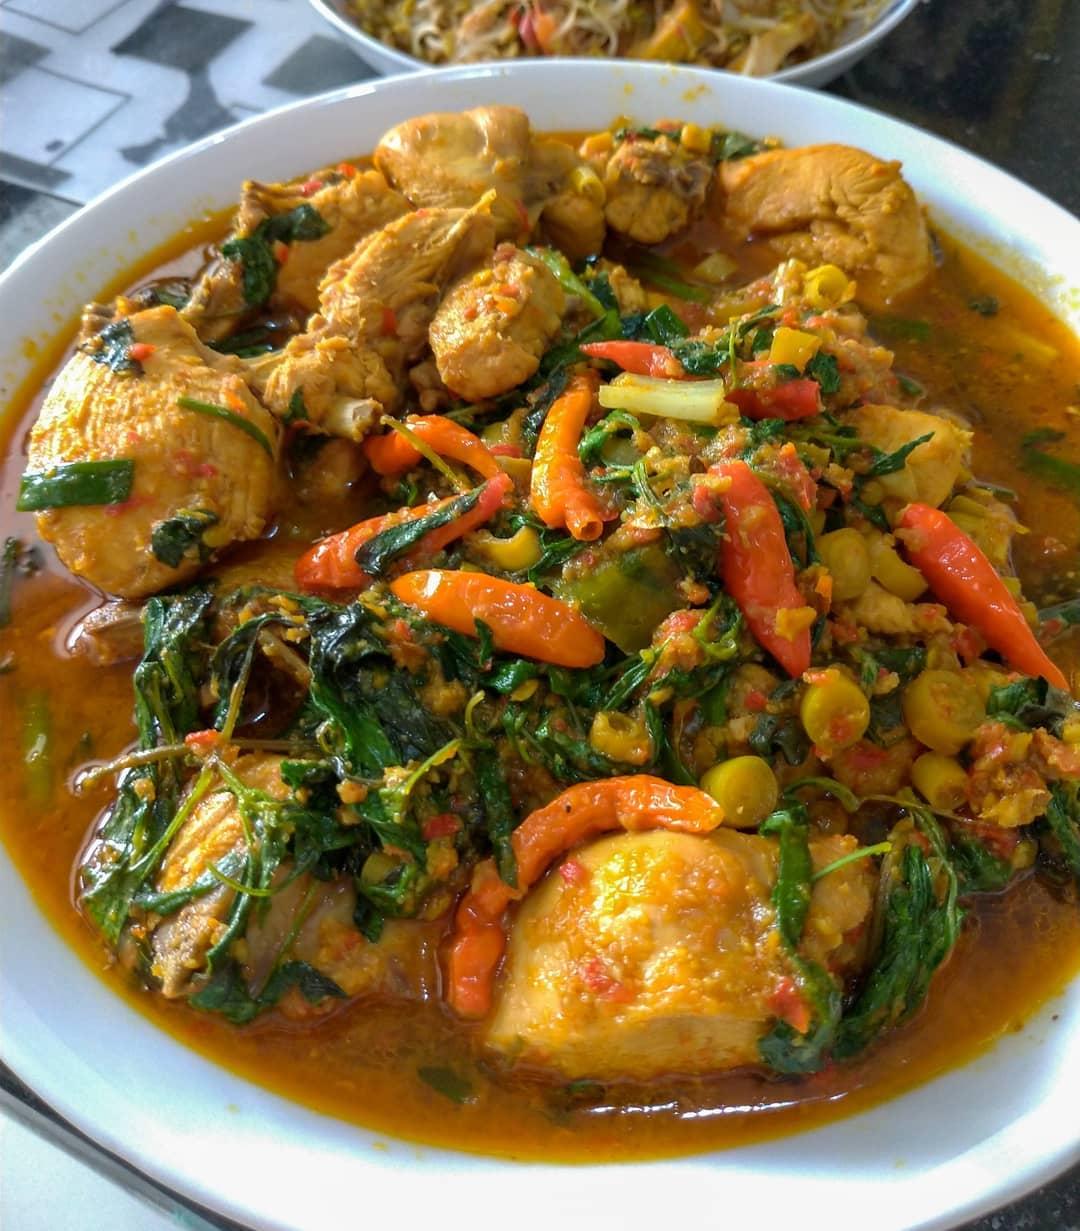 Resep Ayam Woku Bumbu Kuliner Khas Manado